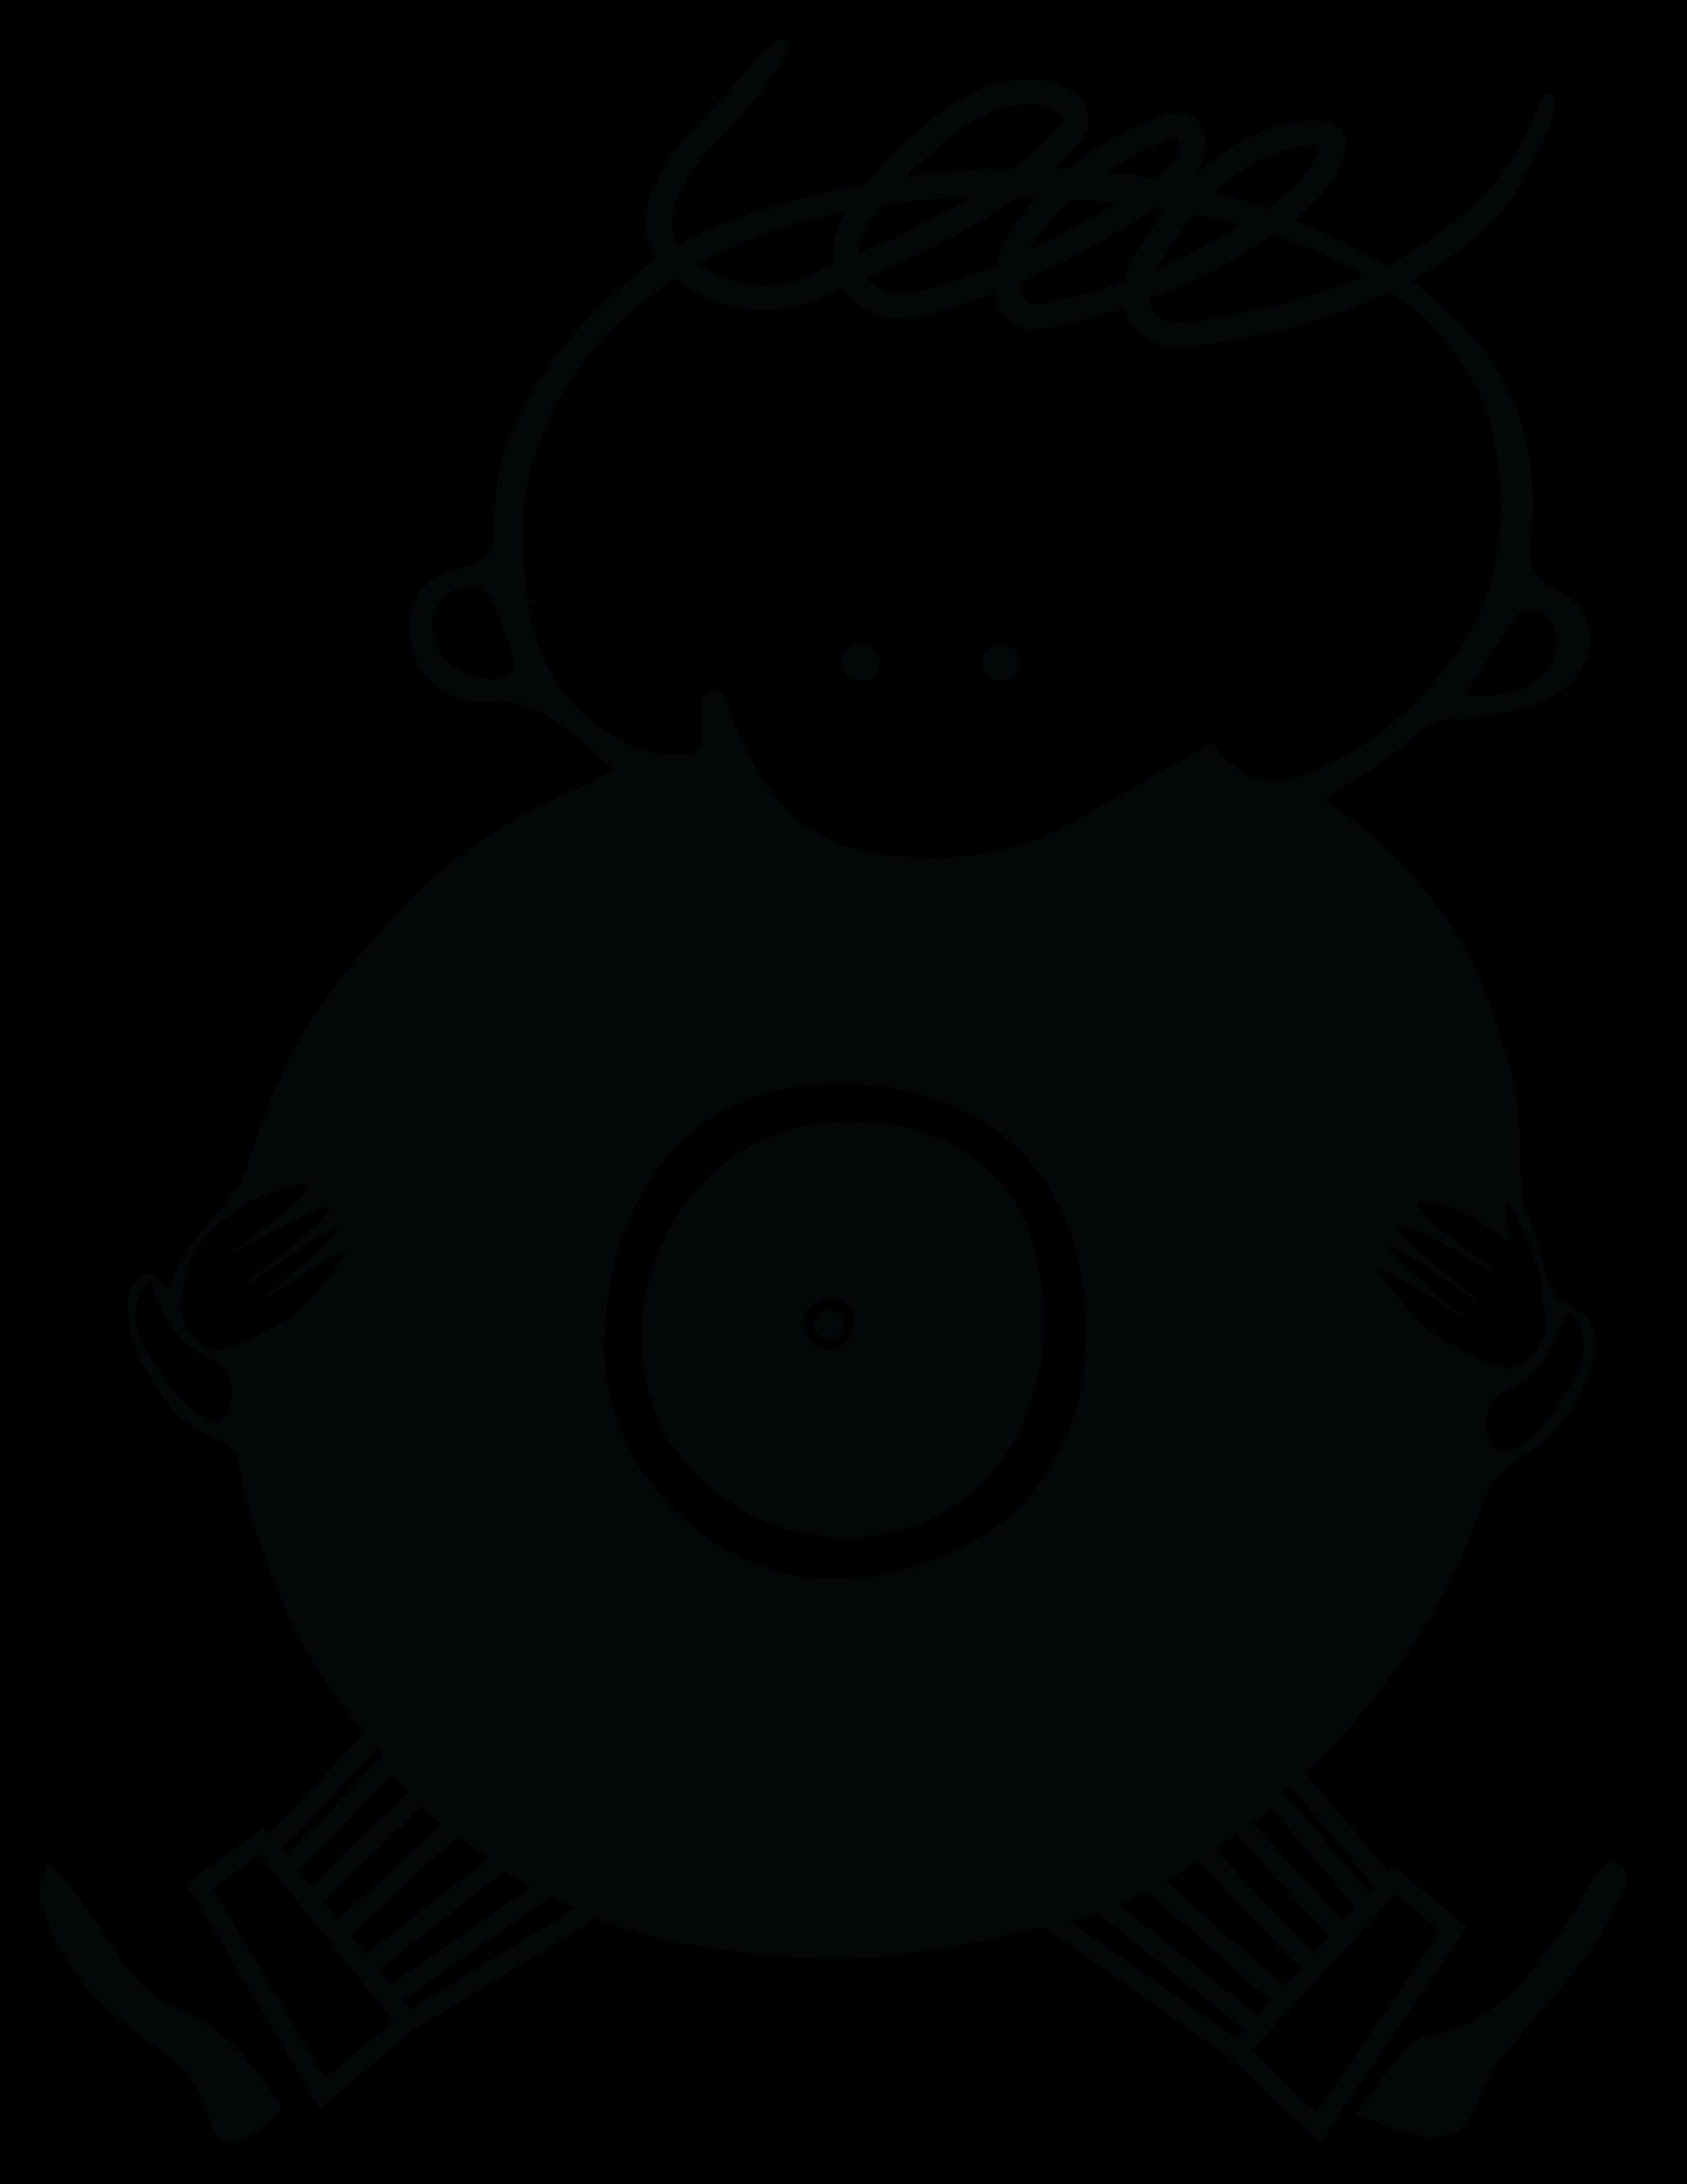 BabyVinyl-01.png